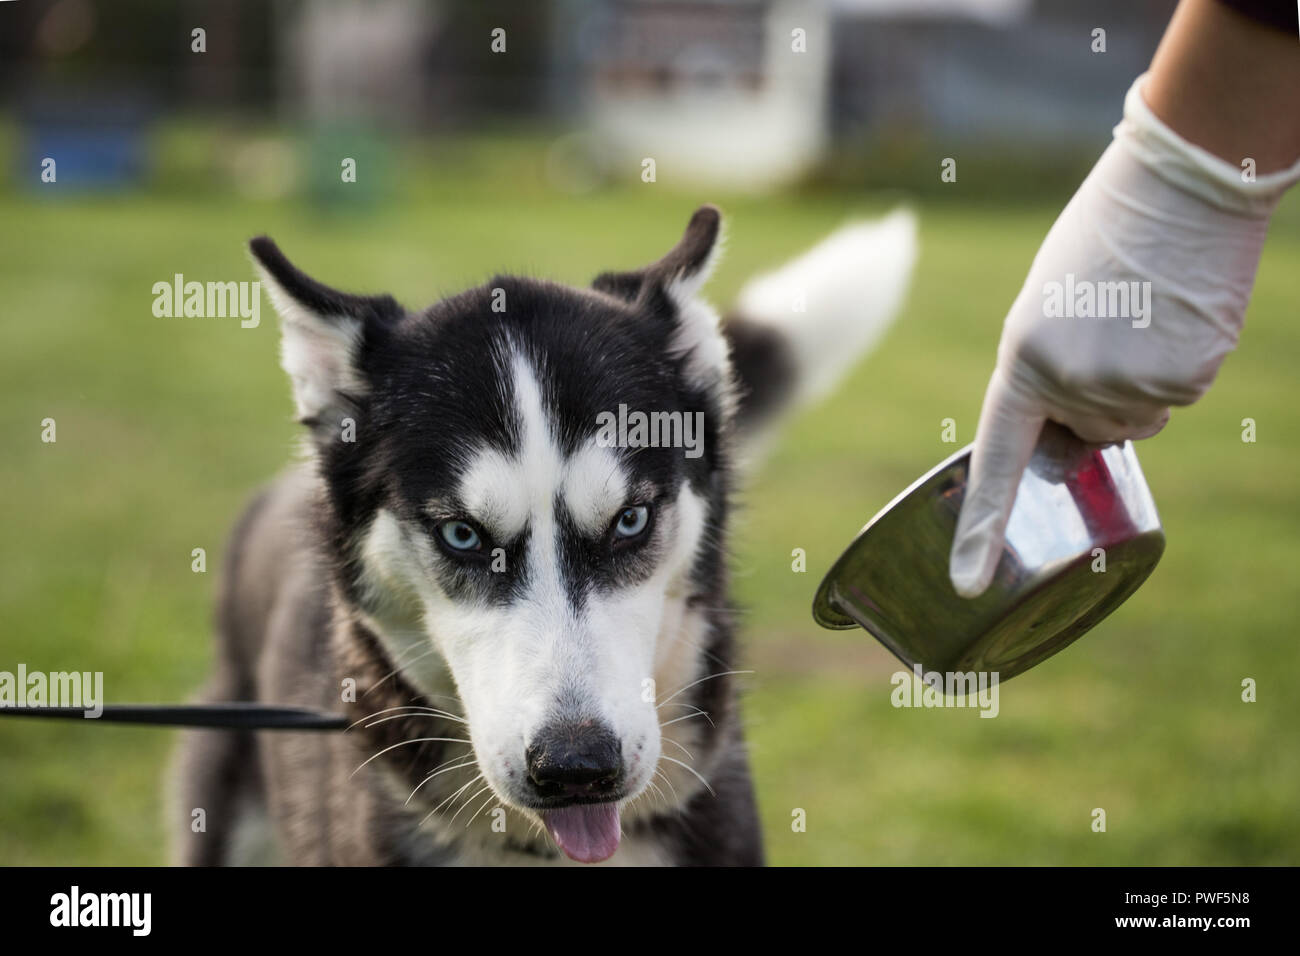 siberian husky dog Stock Photo